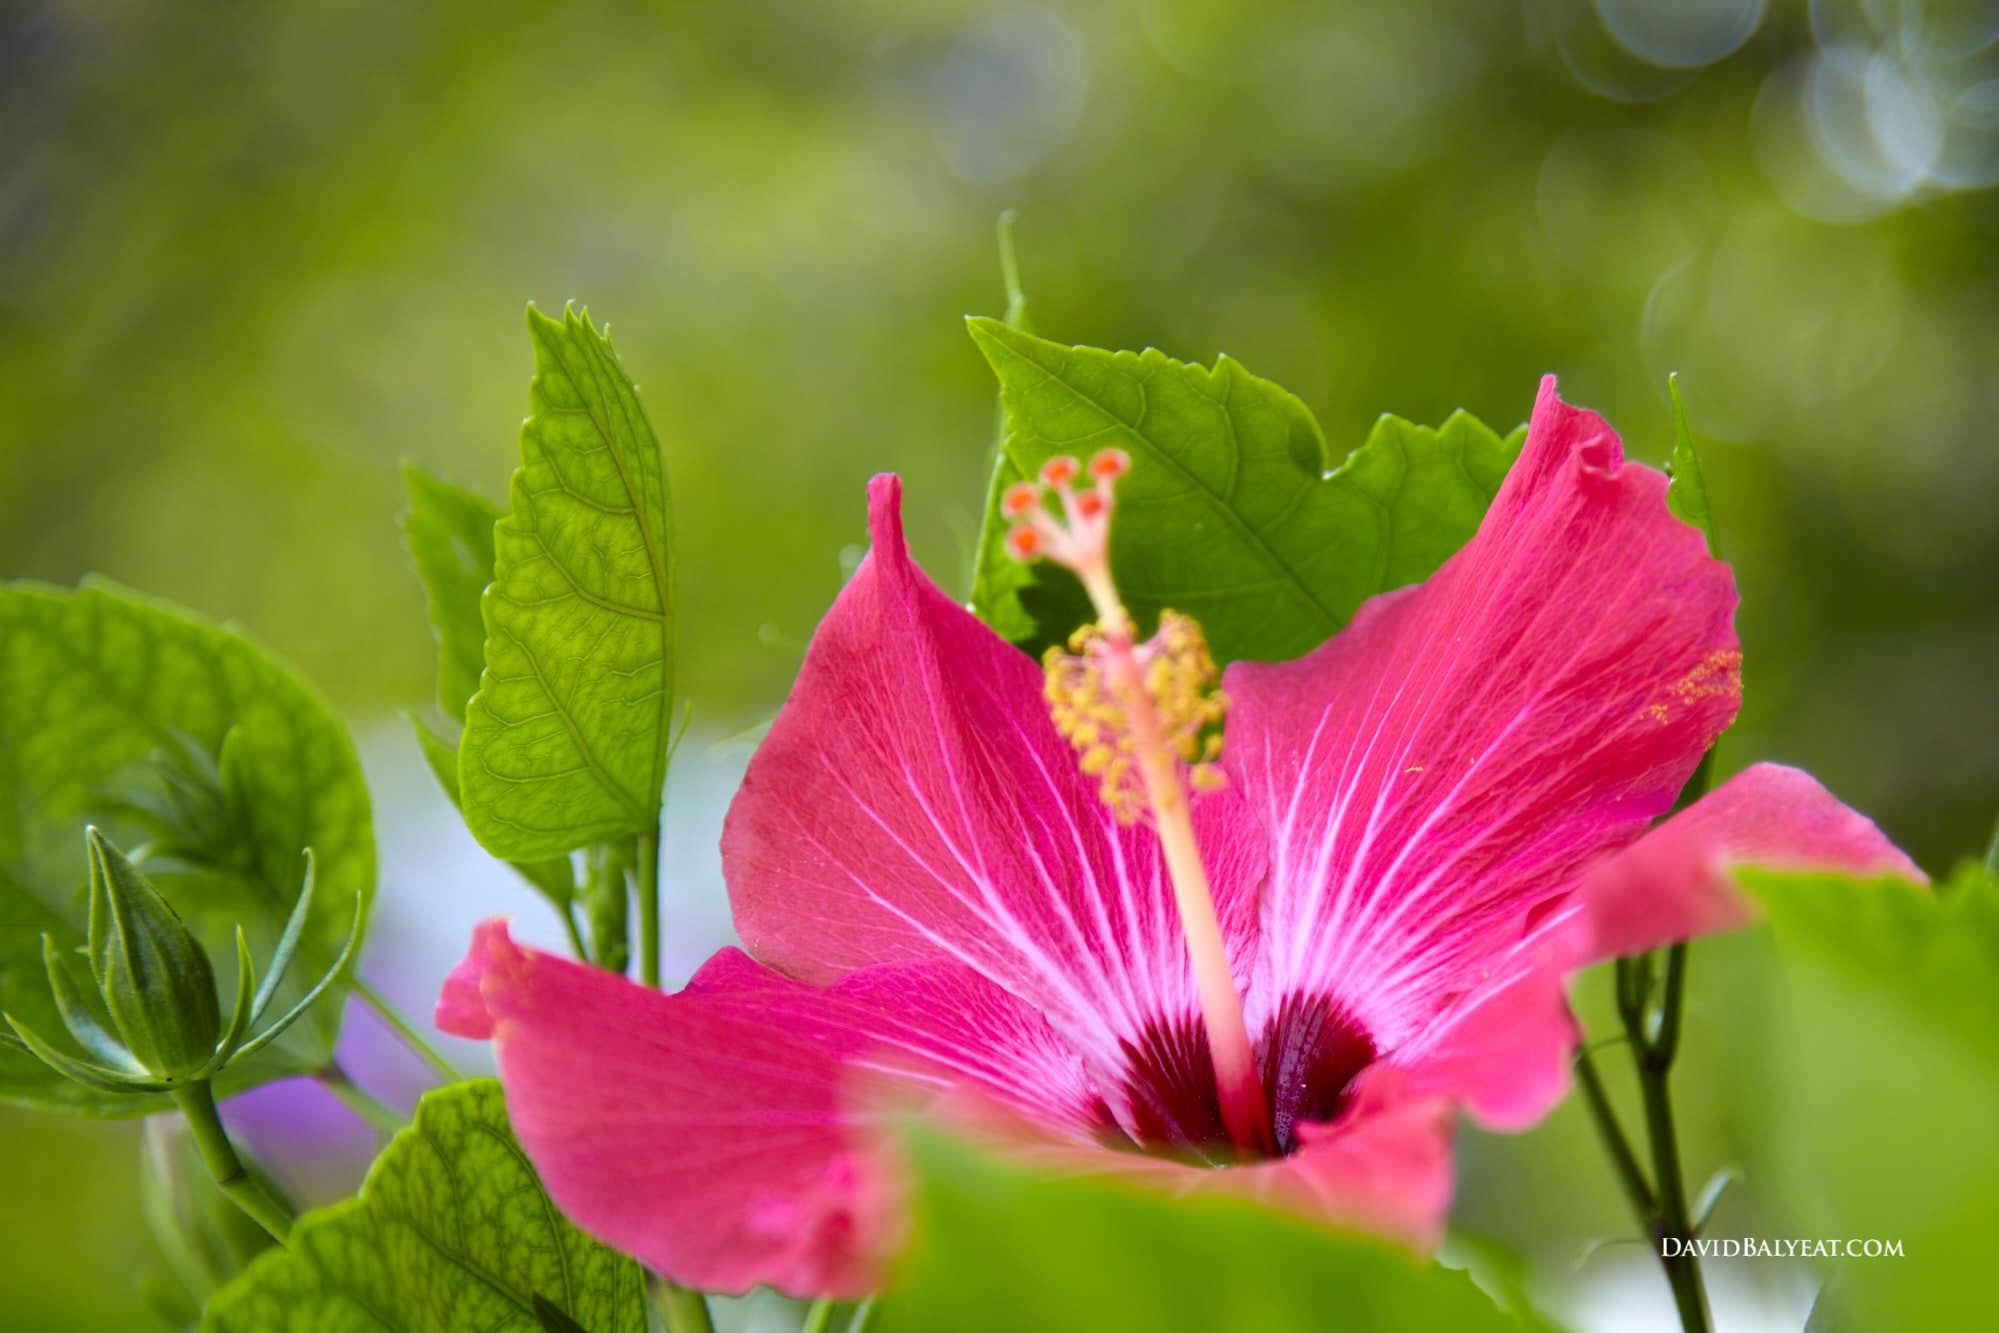 Hibiscus Florida Keys high-definition HD professional landscape photography